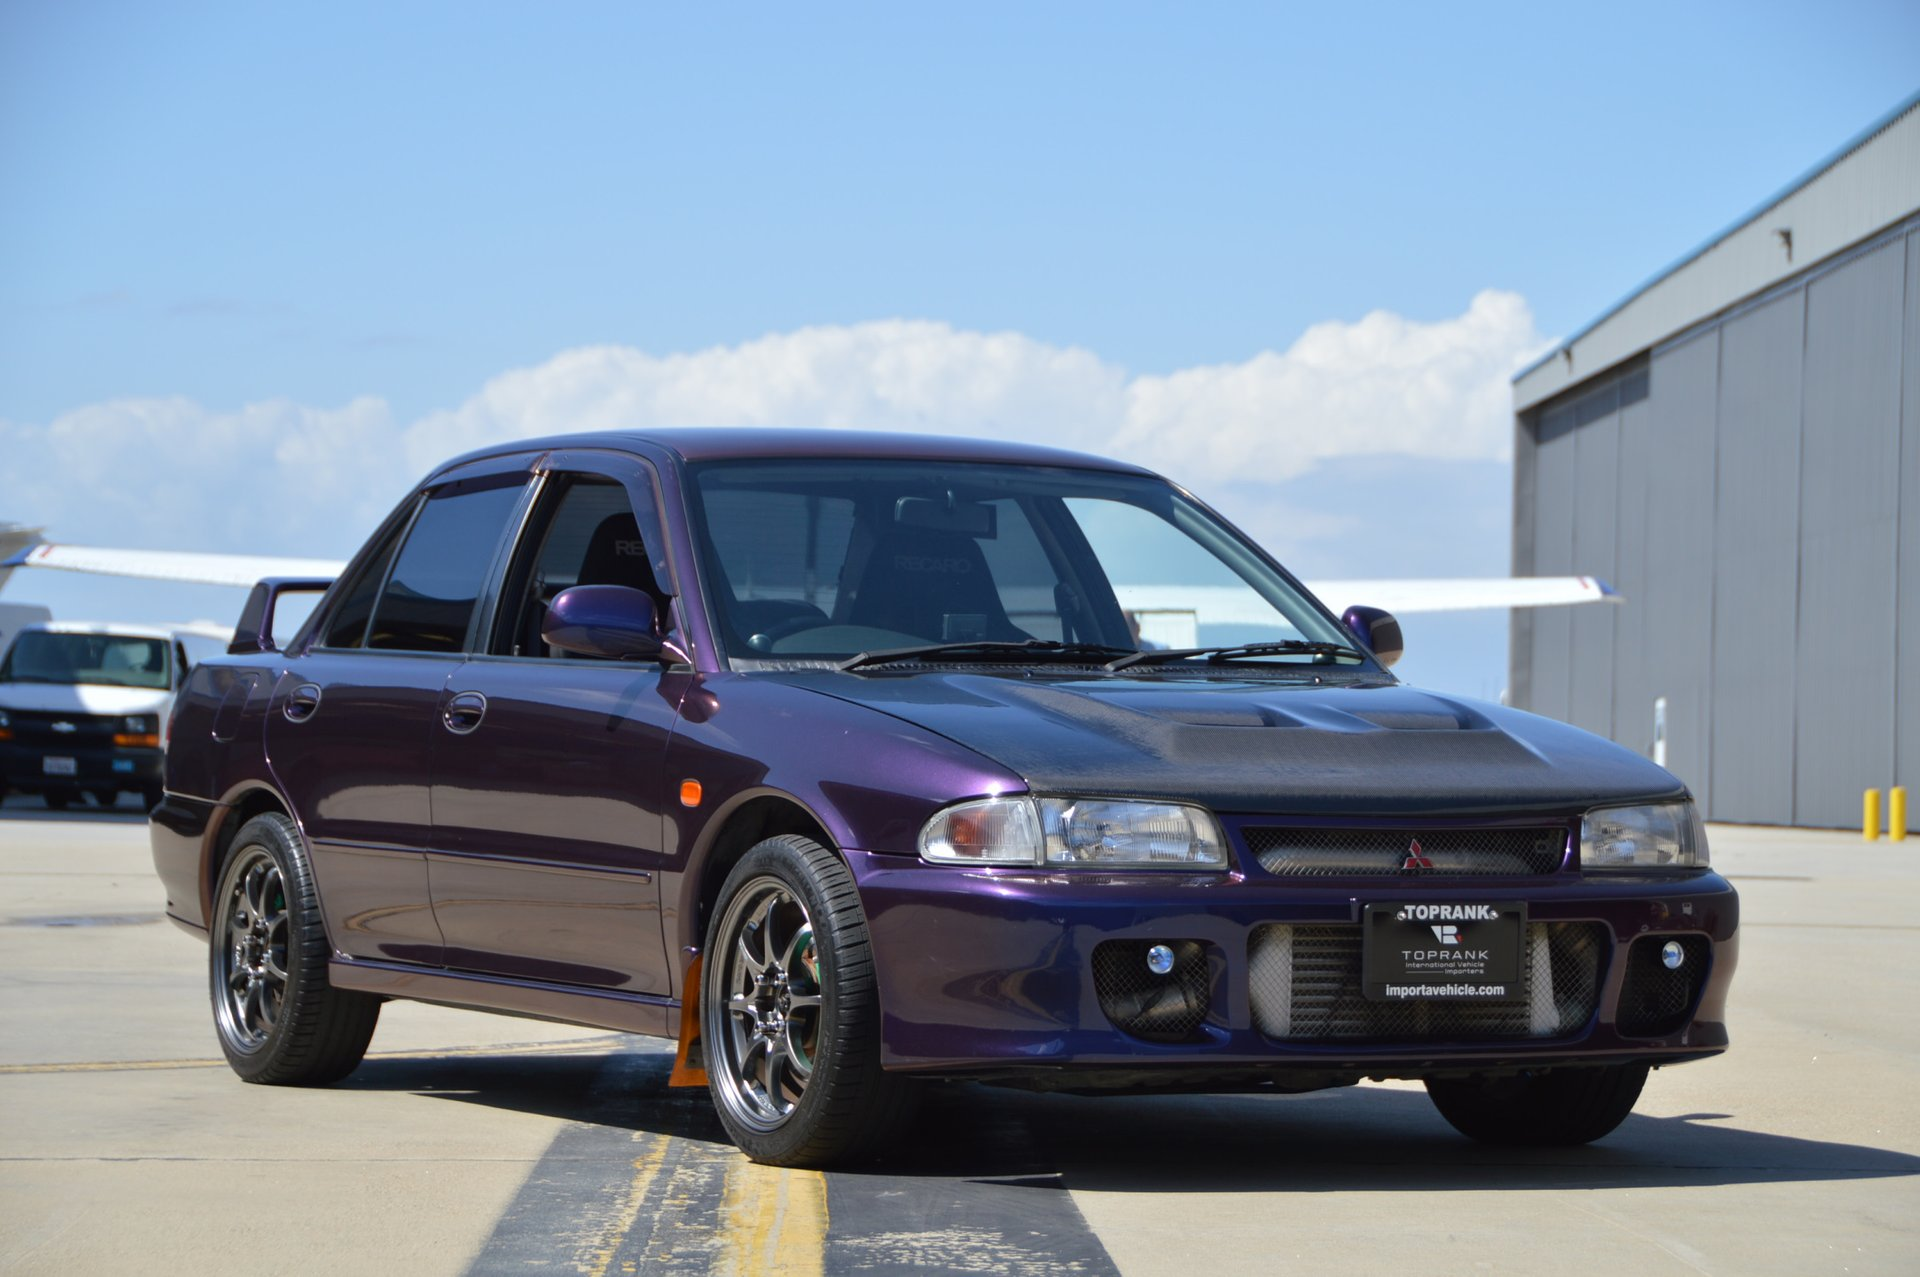 1992 Mitsubishi Lancer Evolution